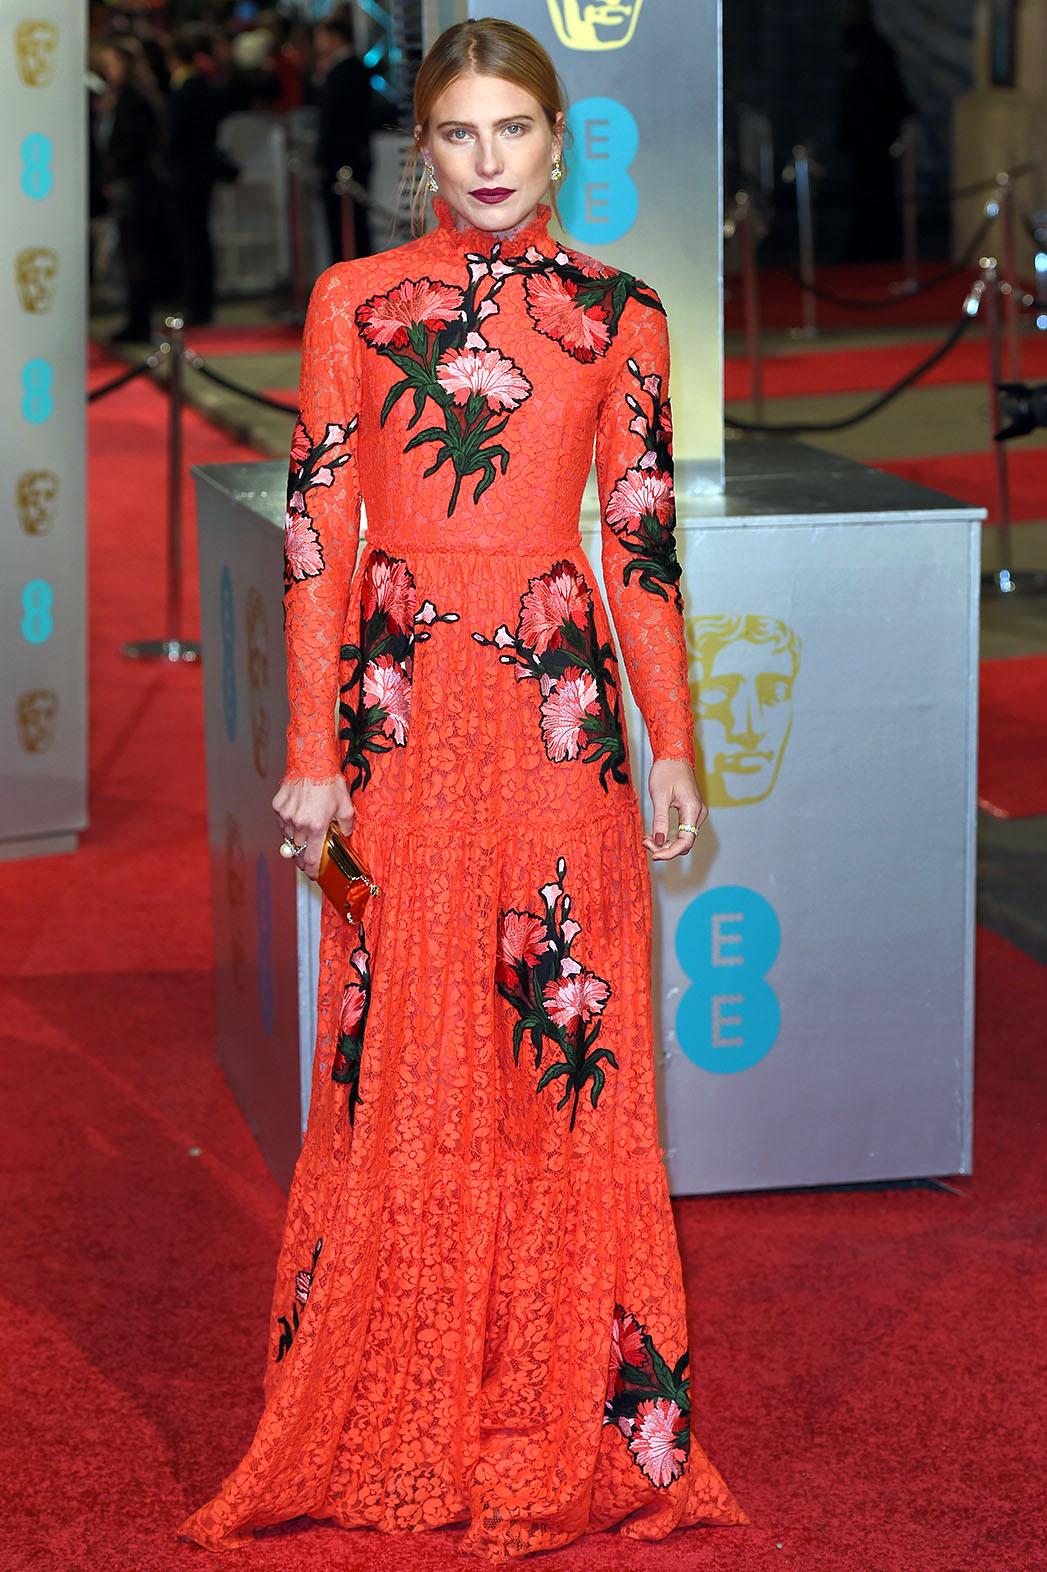 Dree Hemingway attends the EE British Academy Film Award - P 2016